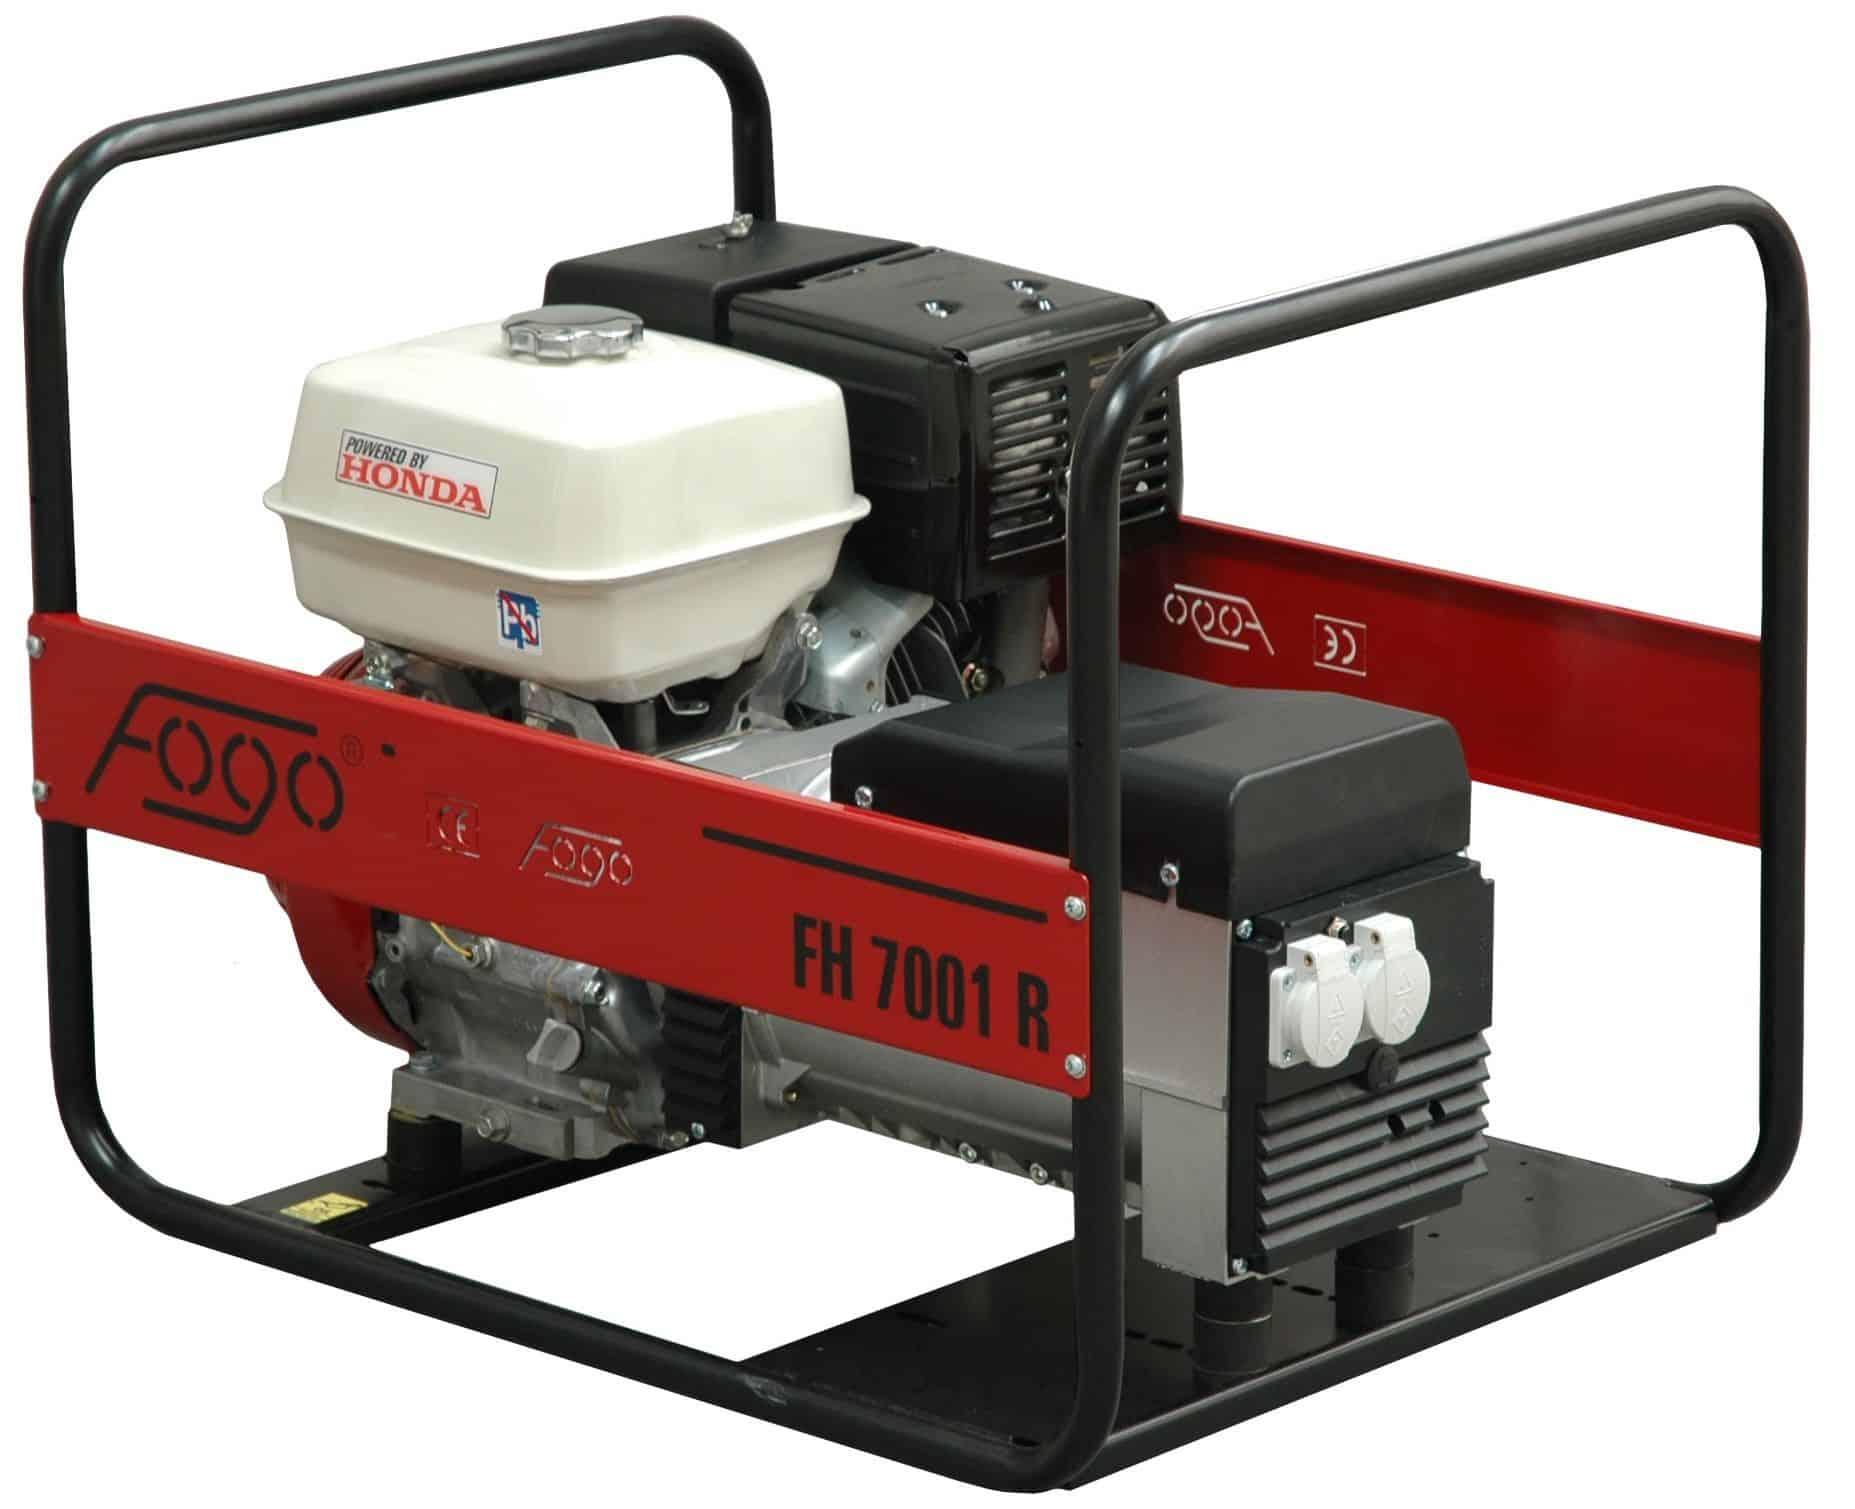 Gas and sel electric generators by Honda FOGO Eisemann Fir